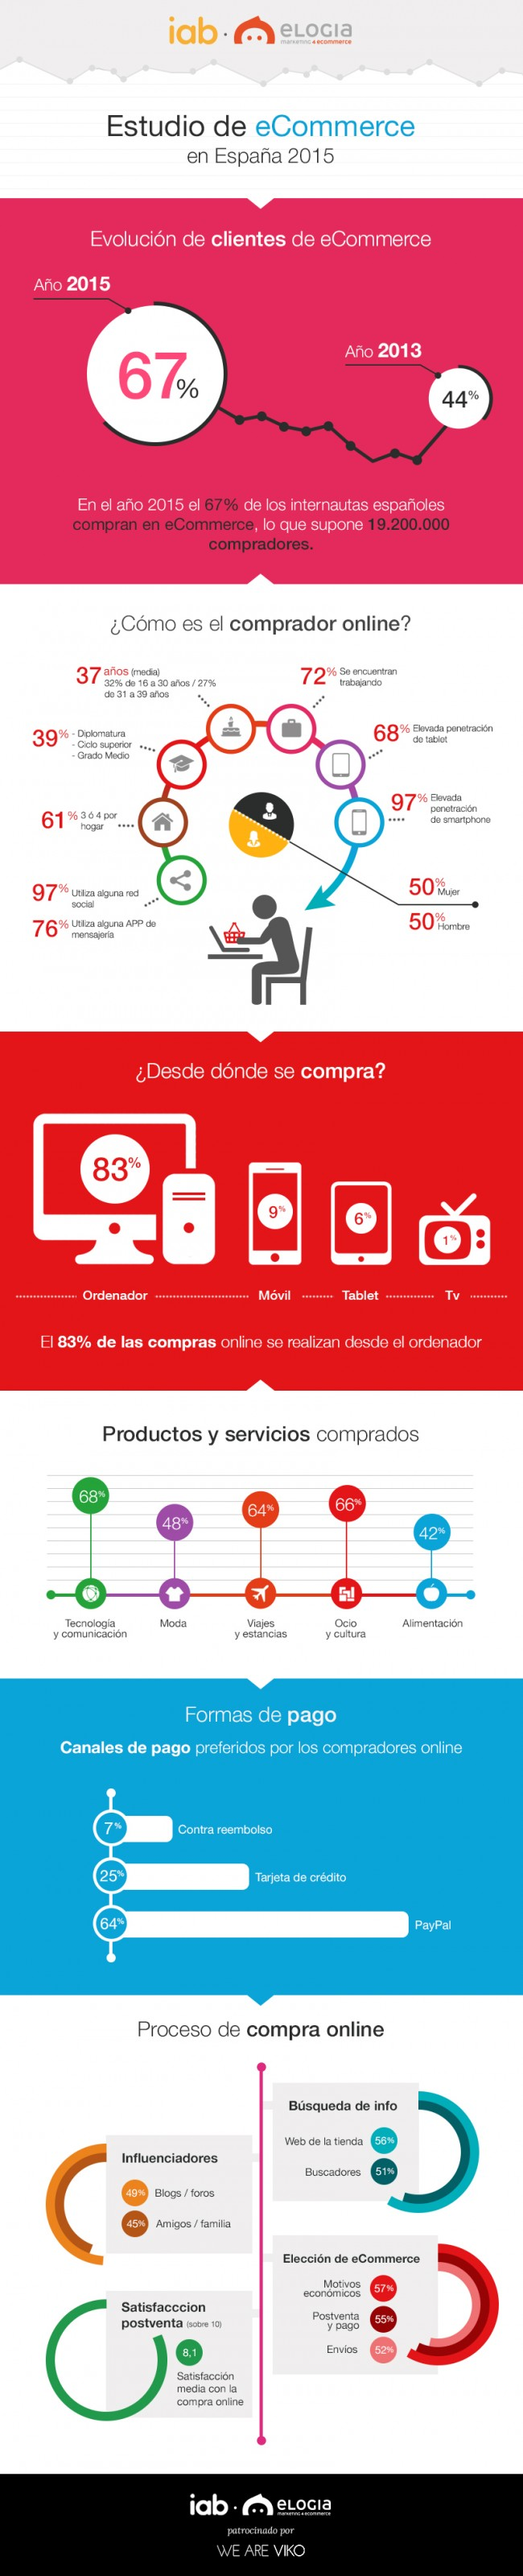 infografia-iab-2015-ecommerce